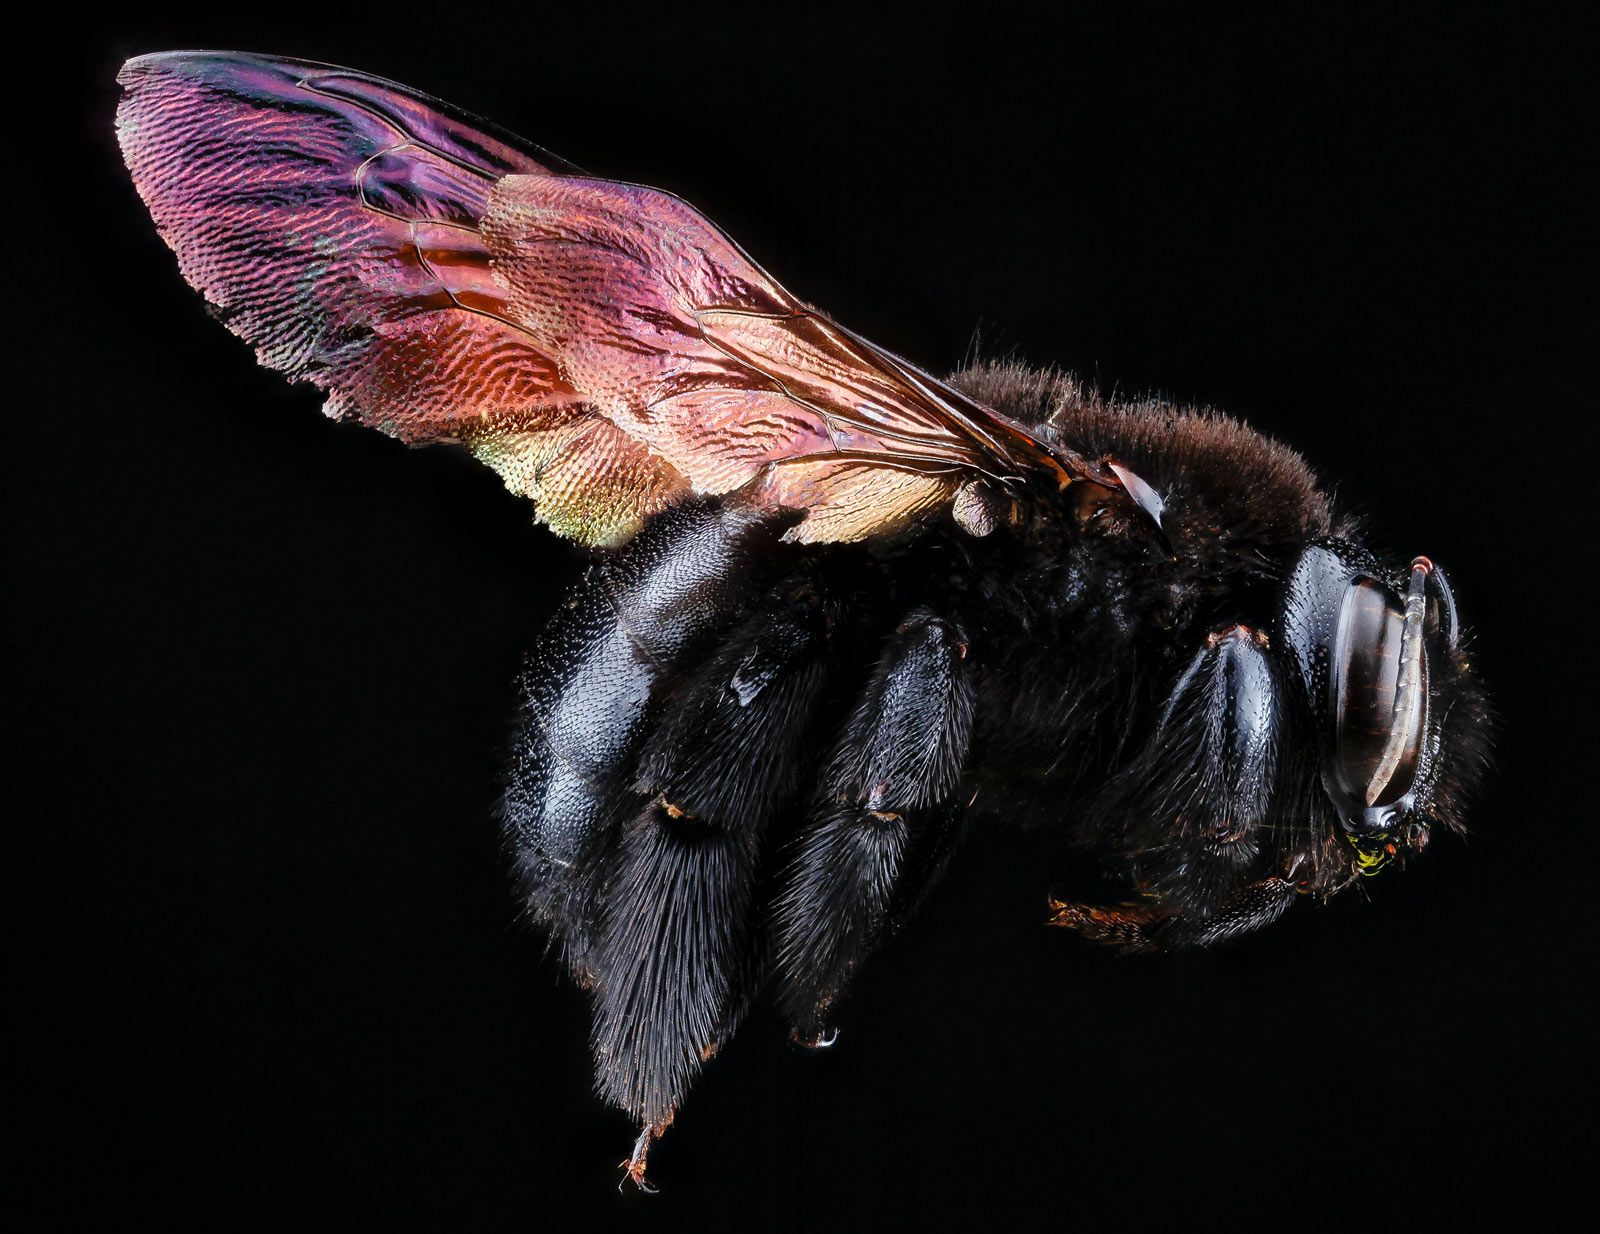 Violet Carpenter Real Bee Xylocopa Violacea Entomology Collectible In Shadowbox